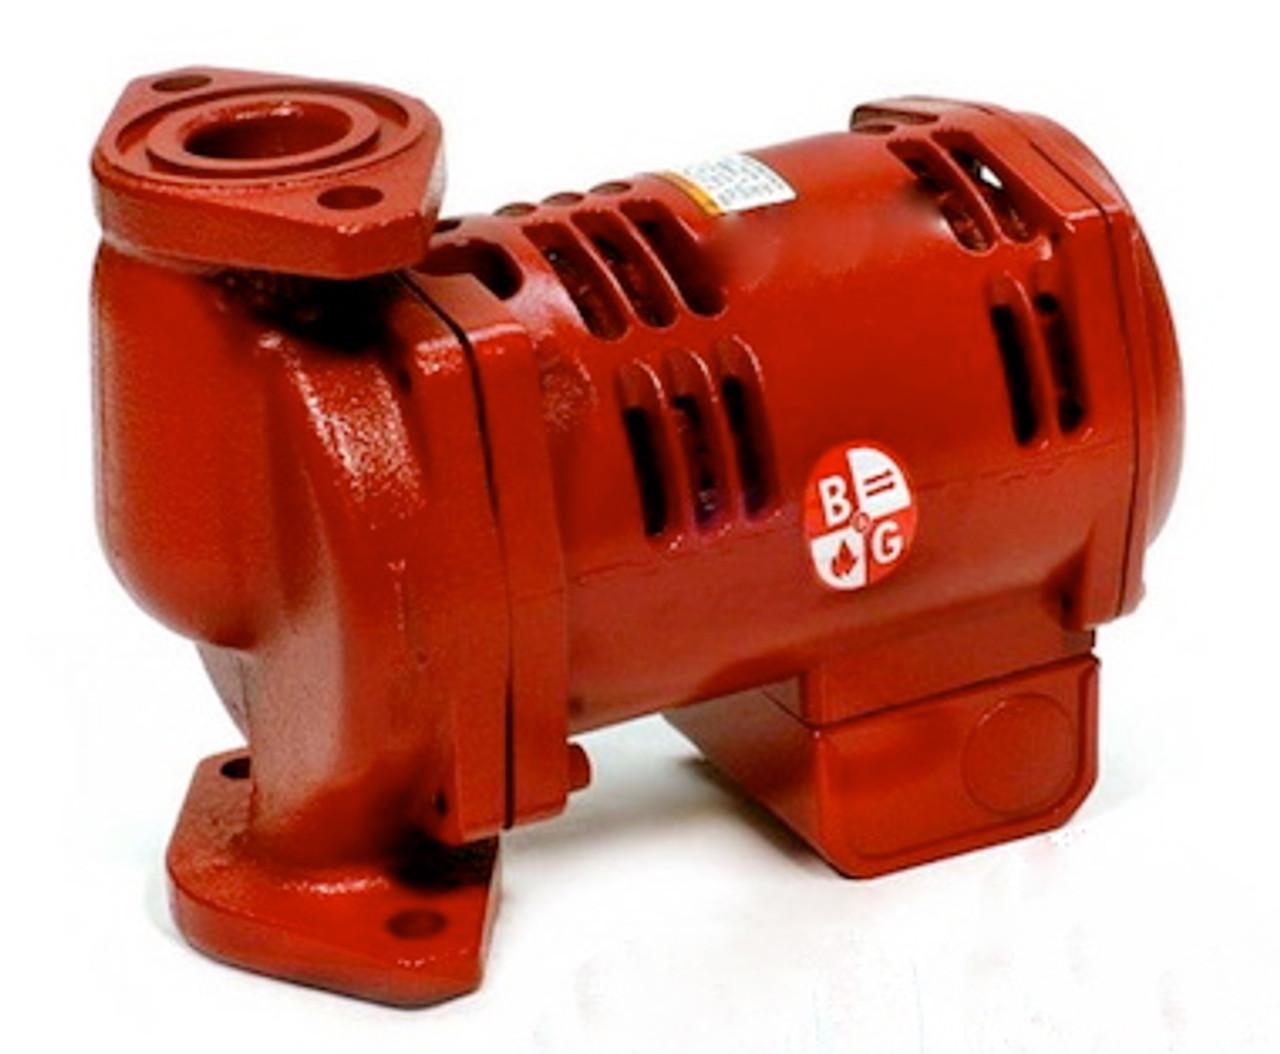 small resolution of 1bl002 bell gossett pl 45 pump national pump supply bell gossett wiring diagram